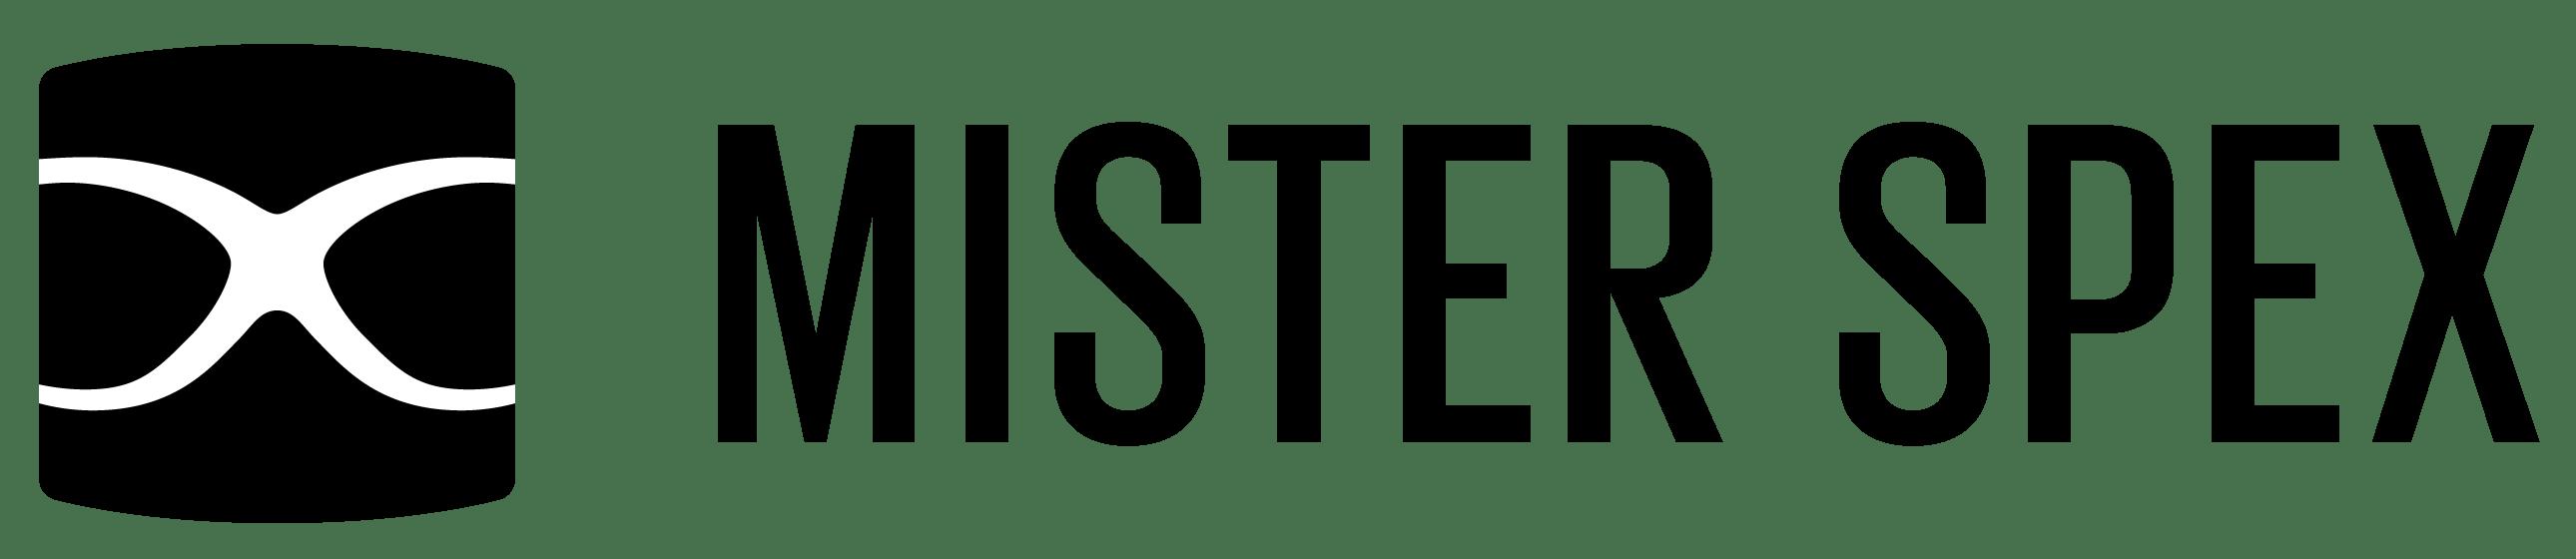 misterspex_logo